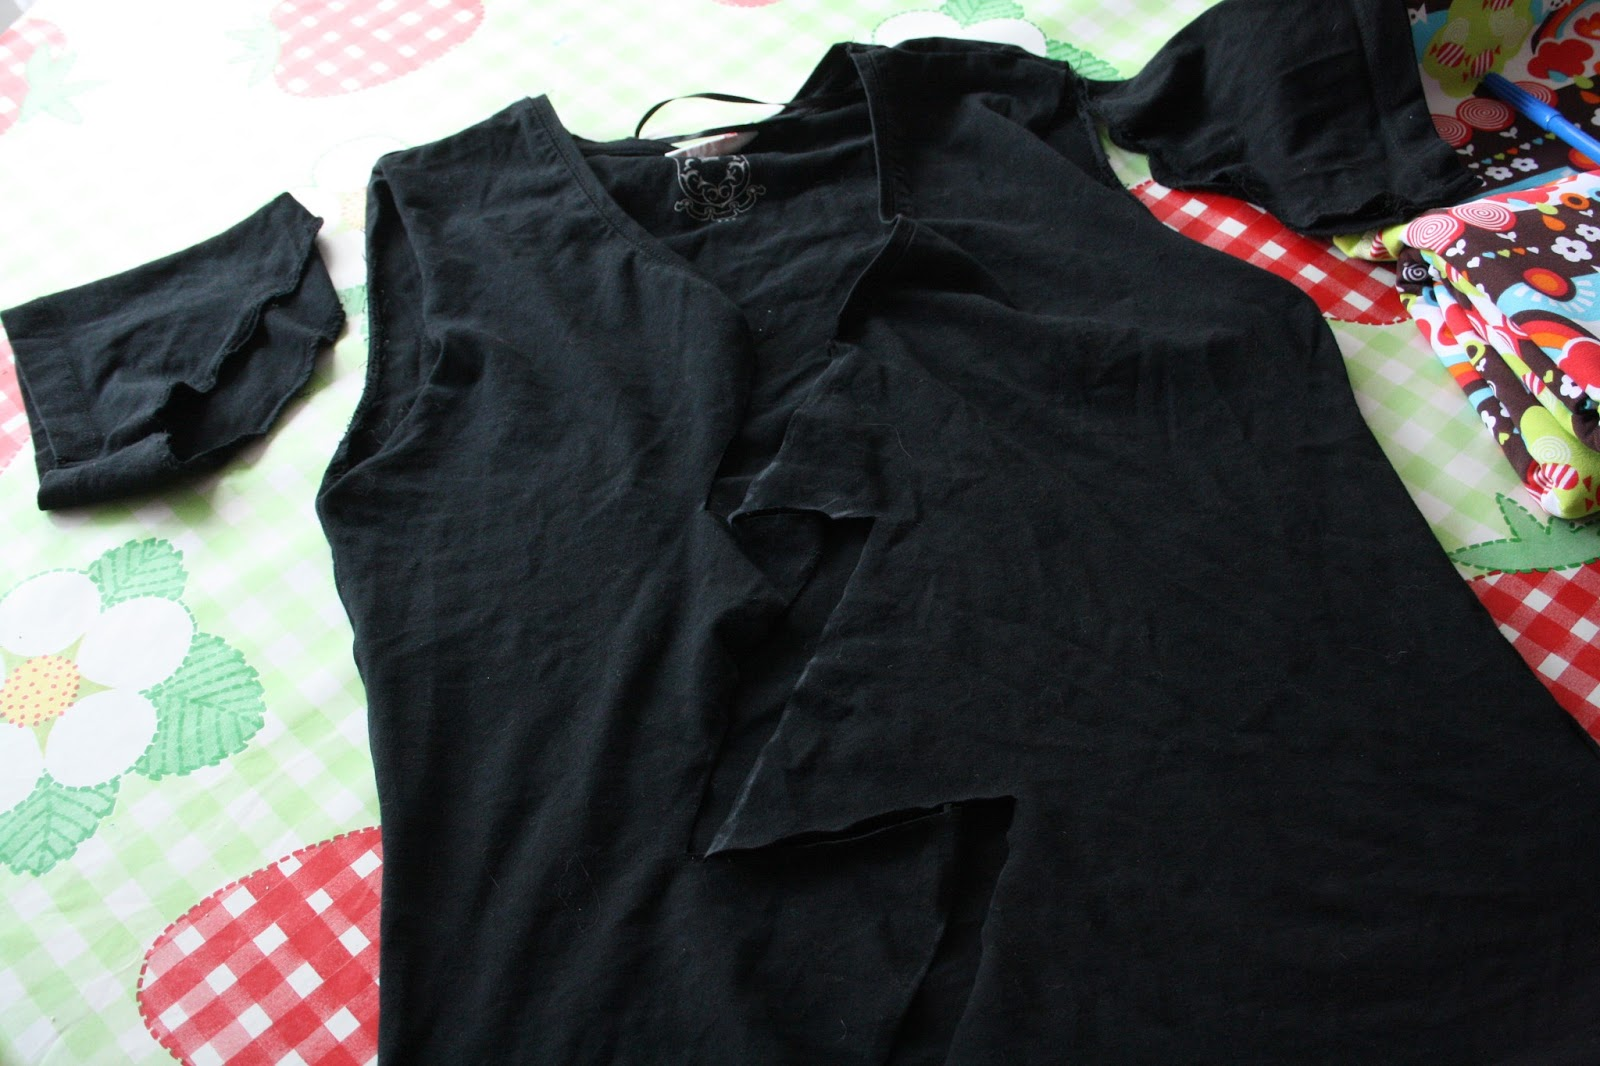 dramina upcycling dienstag bolt n bow shirt. Black Bedroom Furniture Sets. Home Design Ideas